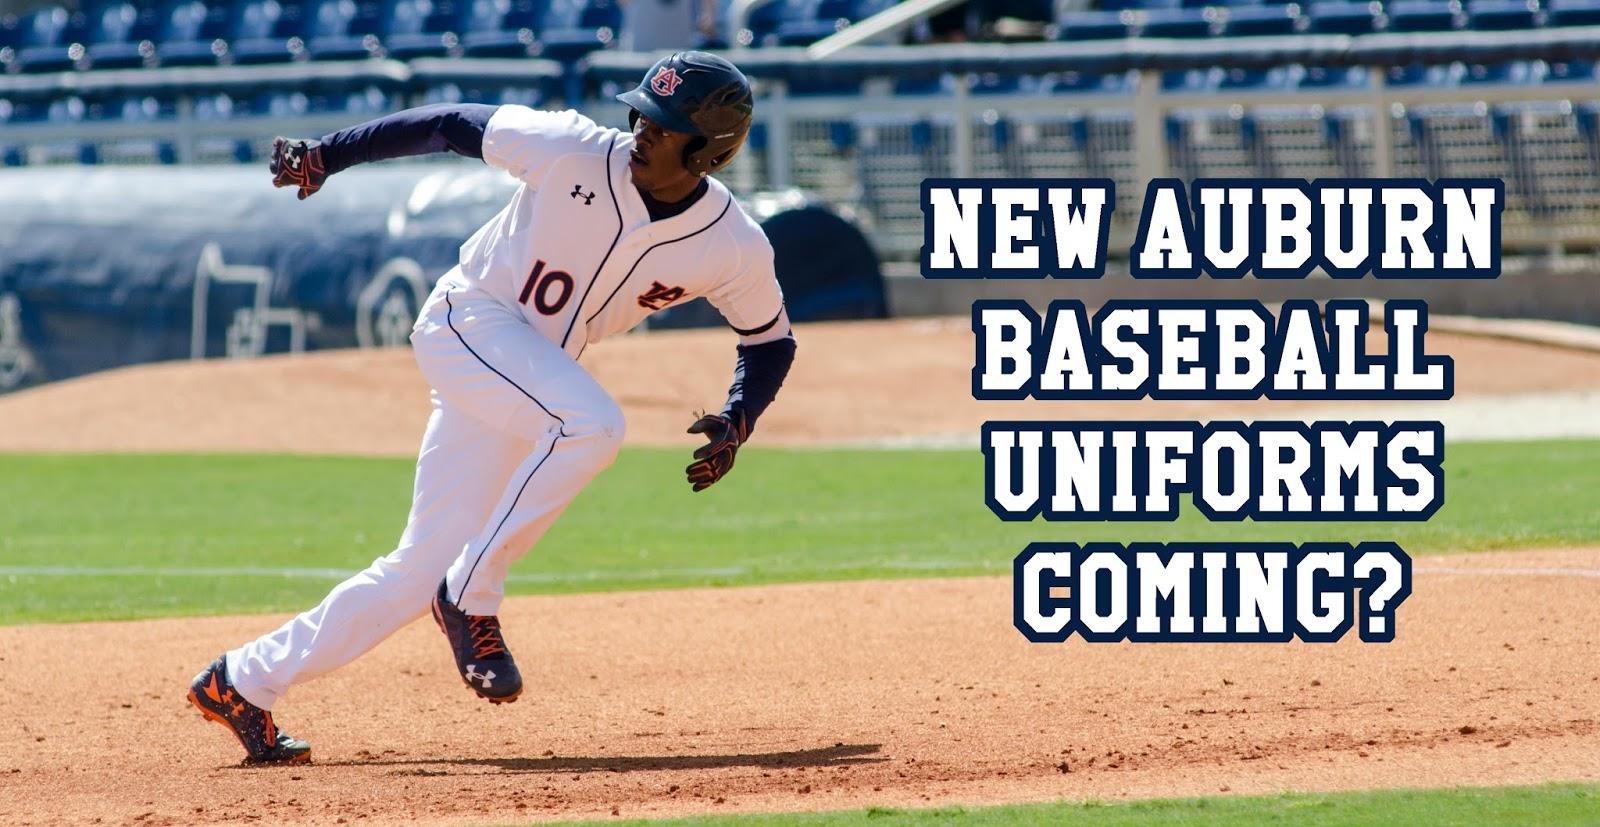 New Uniforms Coming For Auburn Baseball